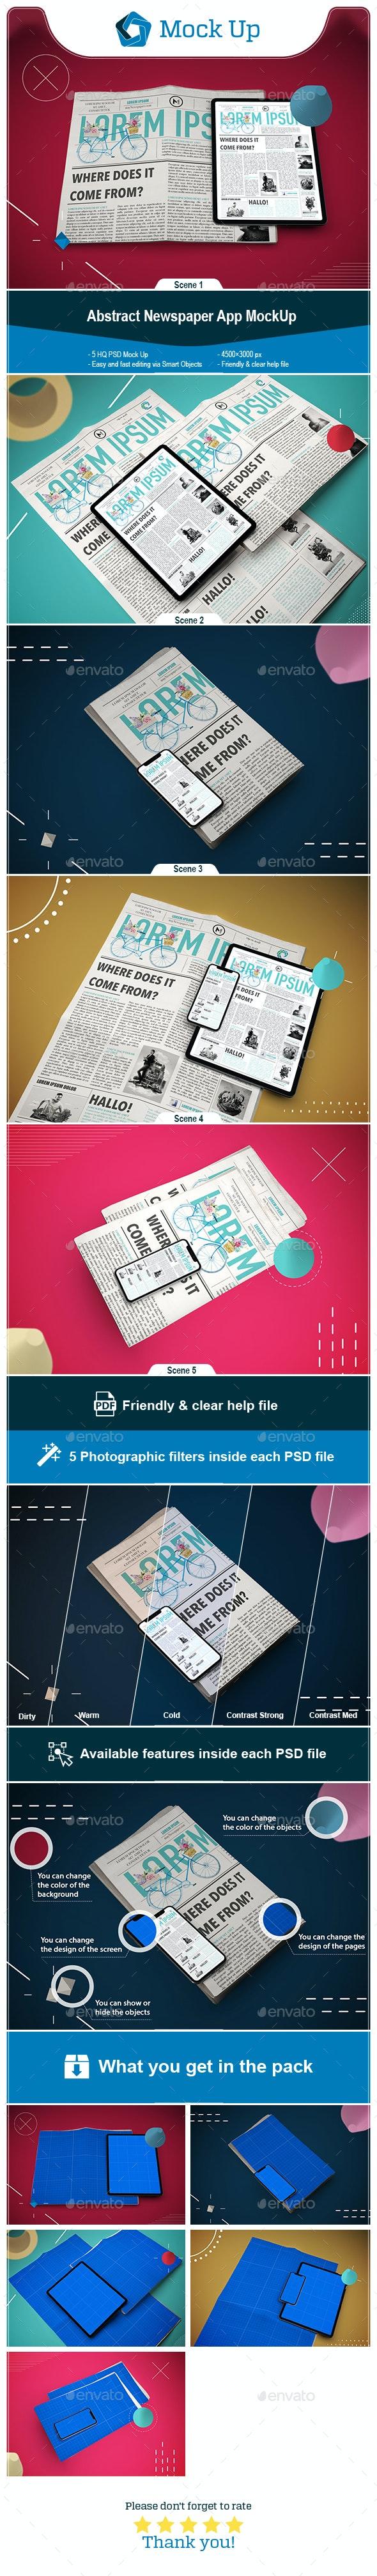 Abstract Newspaper App MockUp - Mobile Displays